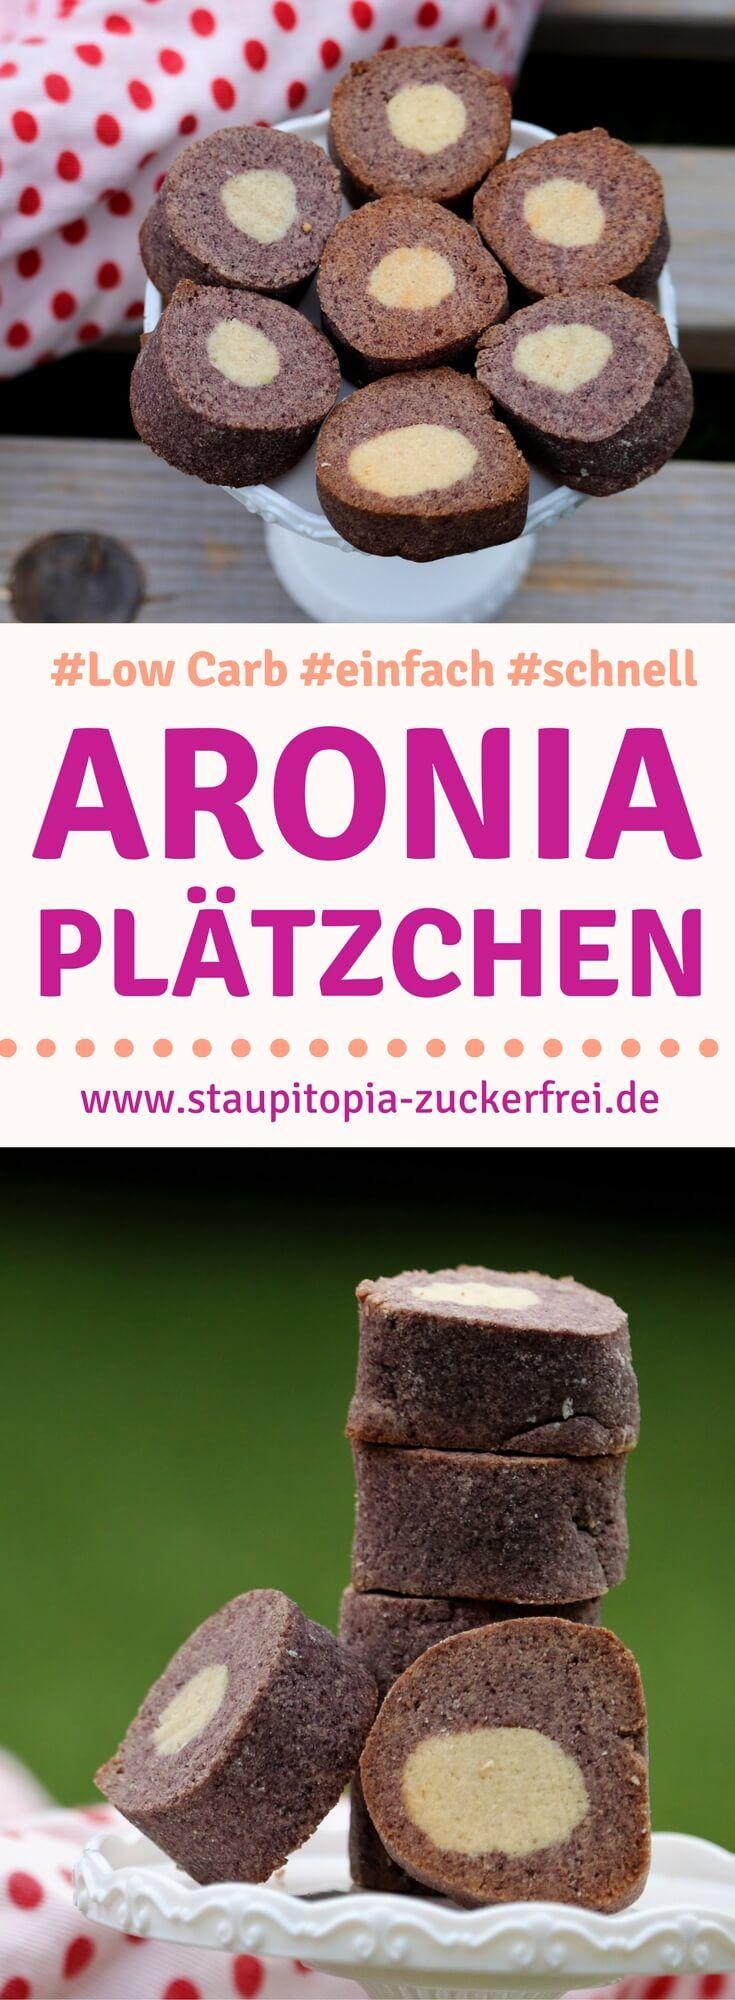 low carb aronia kekse staupitopia zuckerfrei. Black Bedroom Furniture Sets. Home Design Ideas